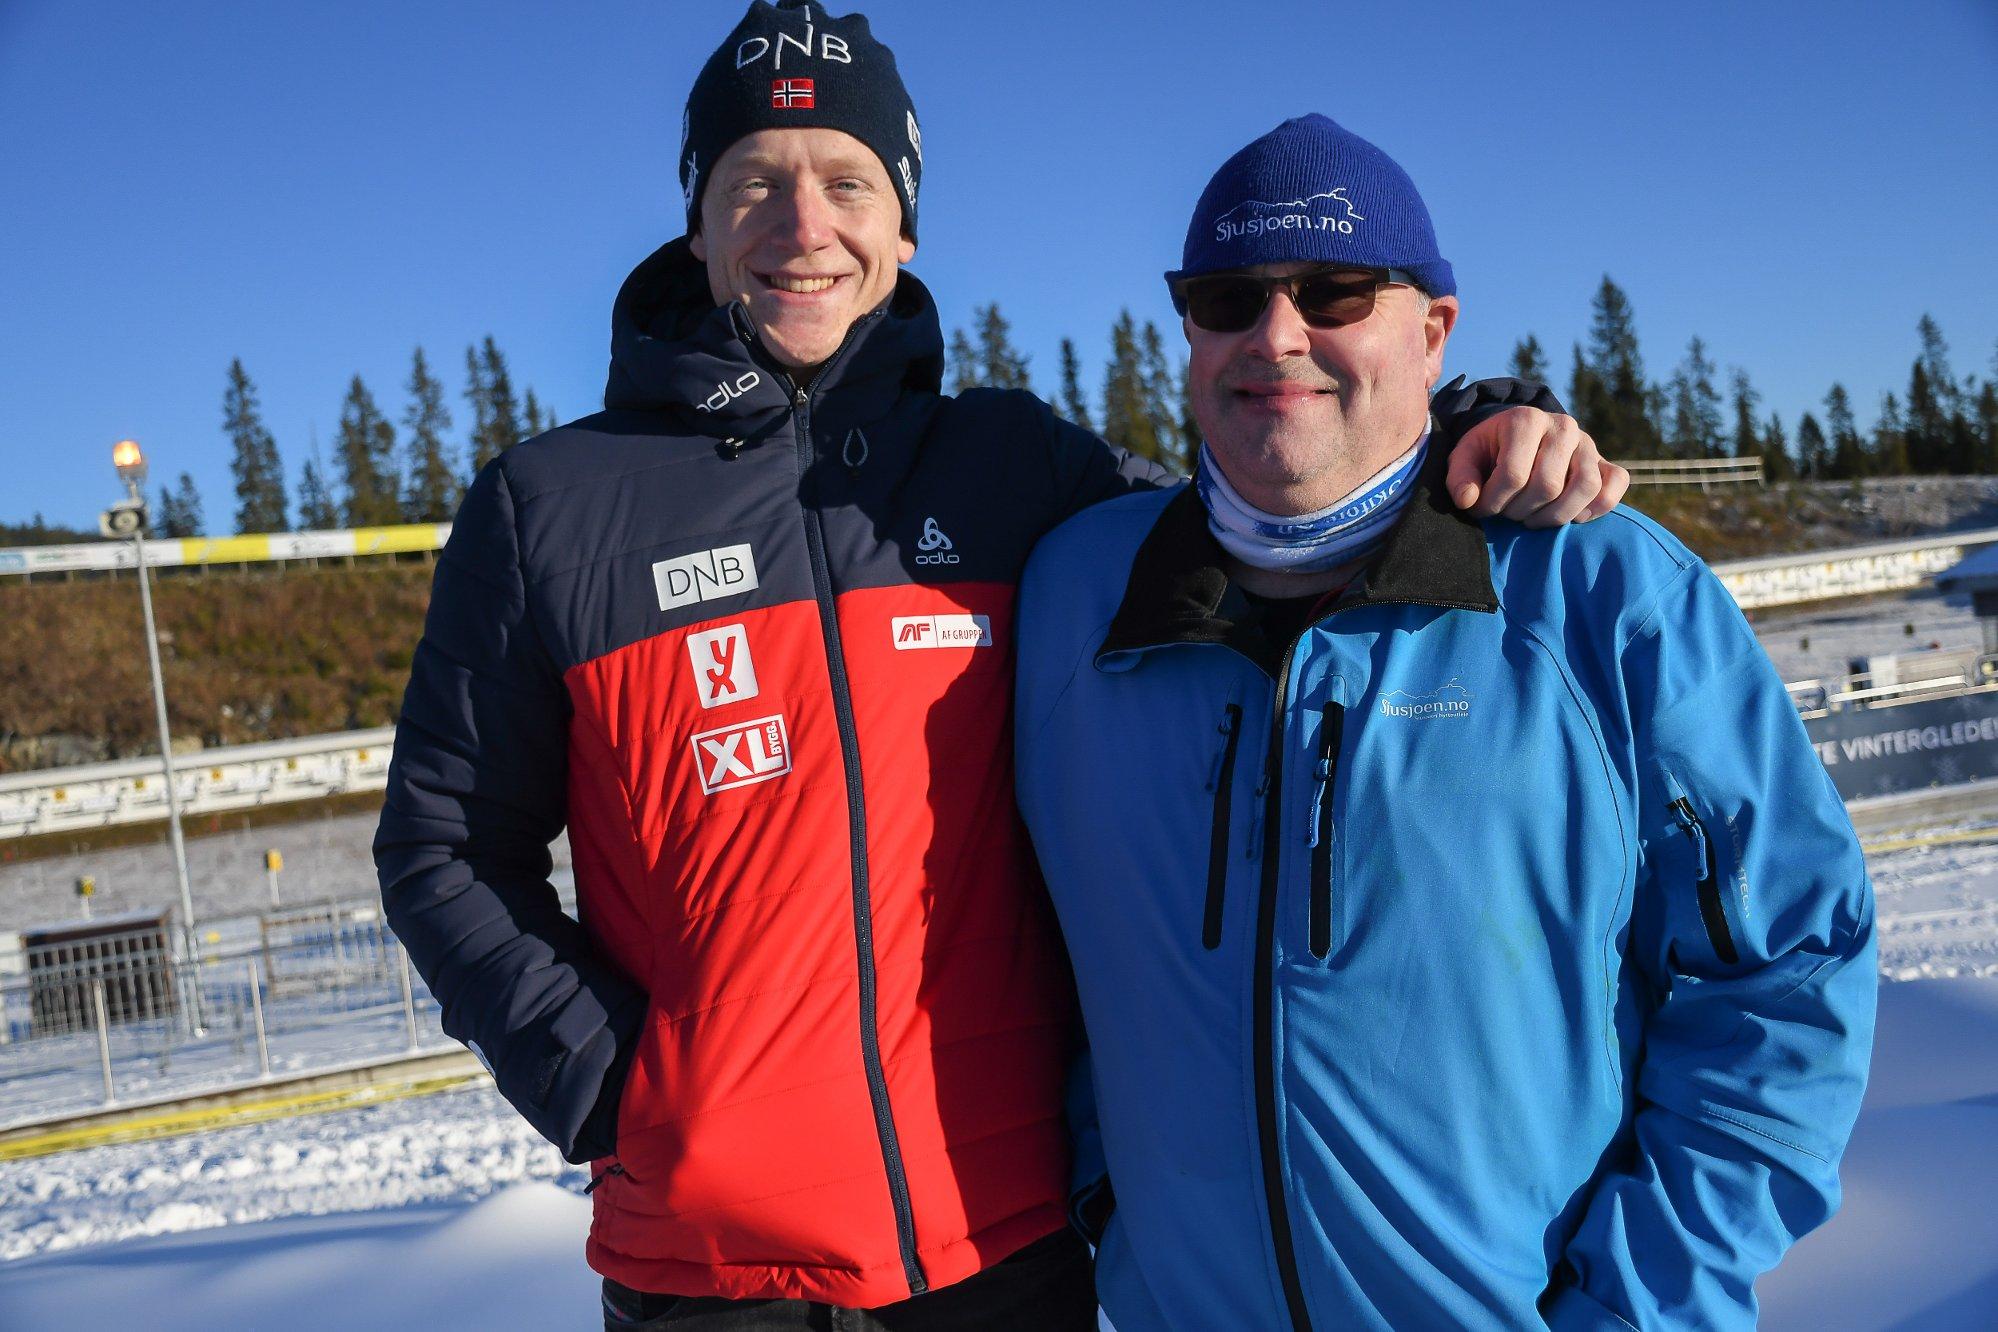 Neraasen og Thingnes Bø håper på verdenscup på Sjusjøen